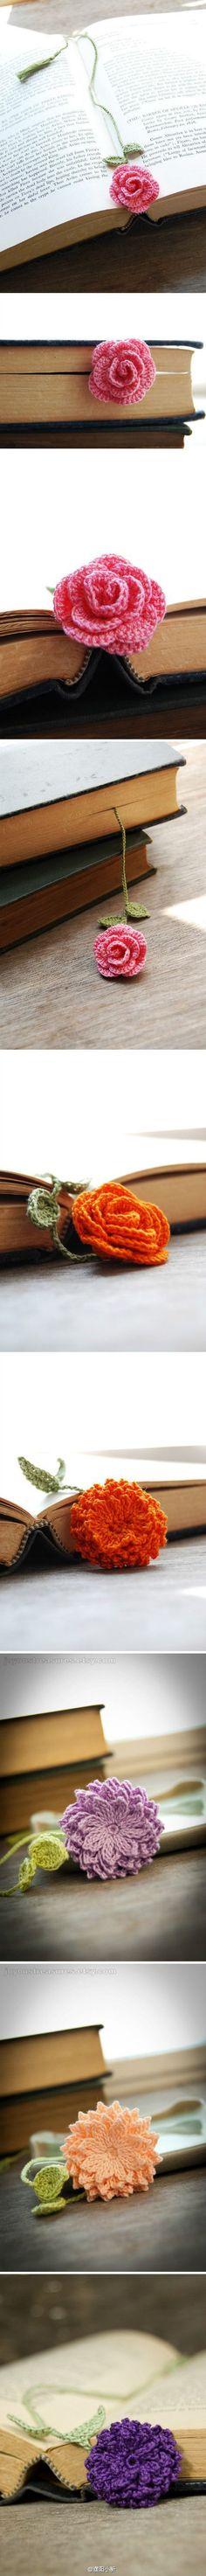 Pretty bookmarks - crochet flowers..                                                                                                                                                                                 Más